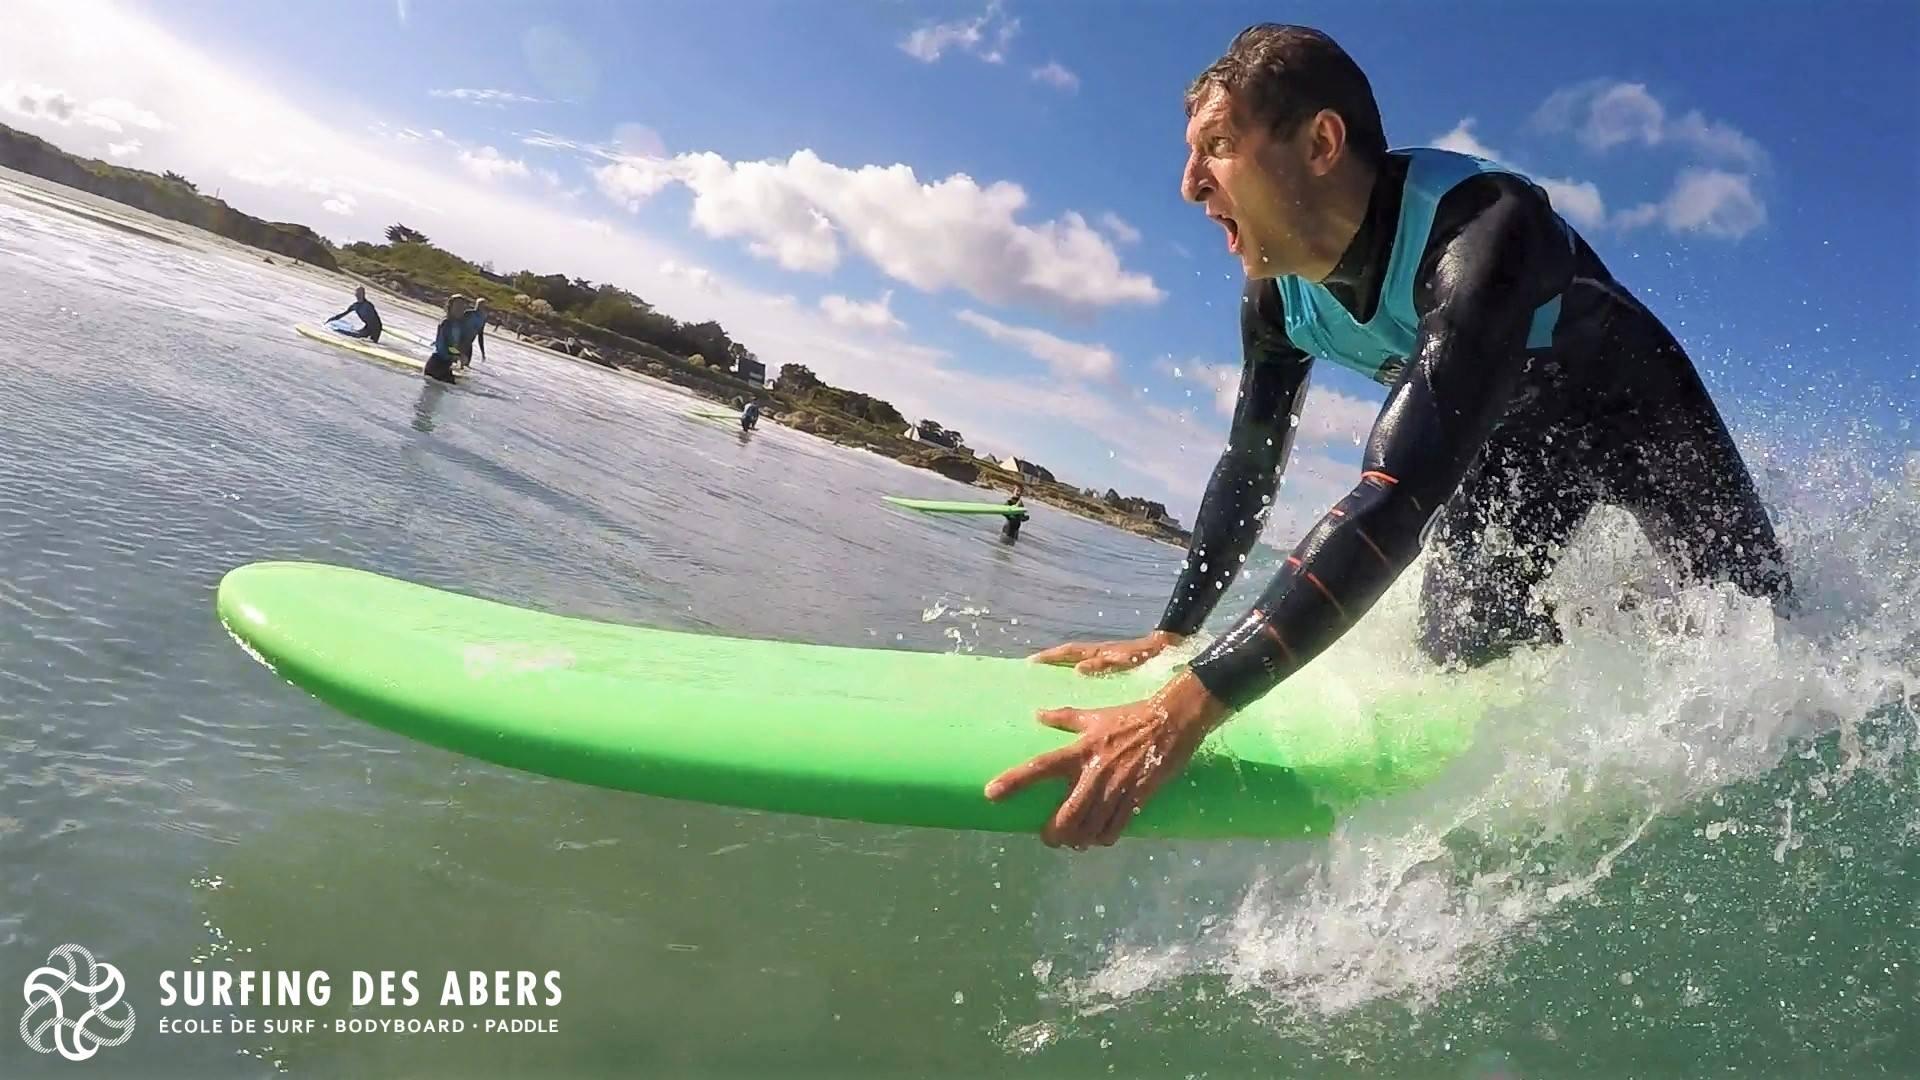 https://www.ligue-bretagne-surf.bzh/wp-content/uploads/2018/01/Surf-Close-Stoked.jpg